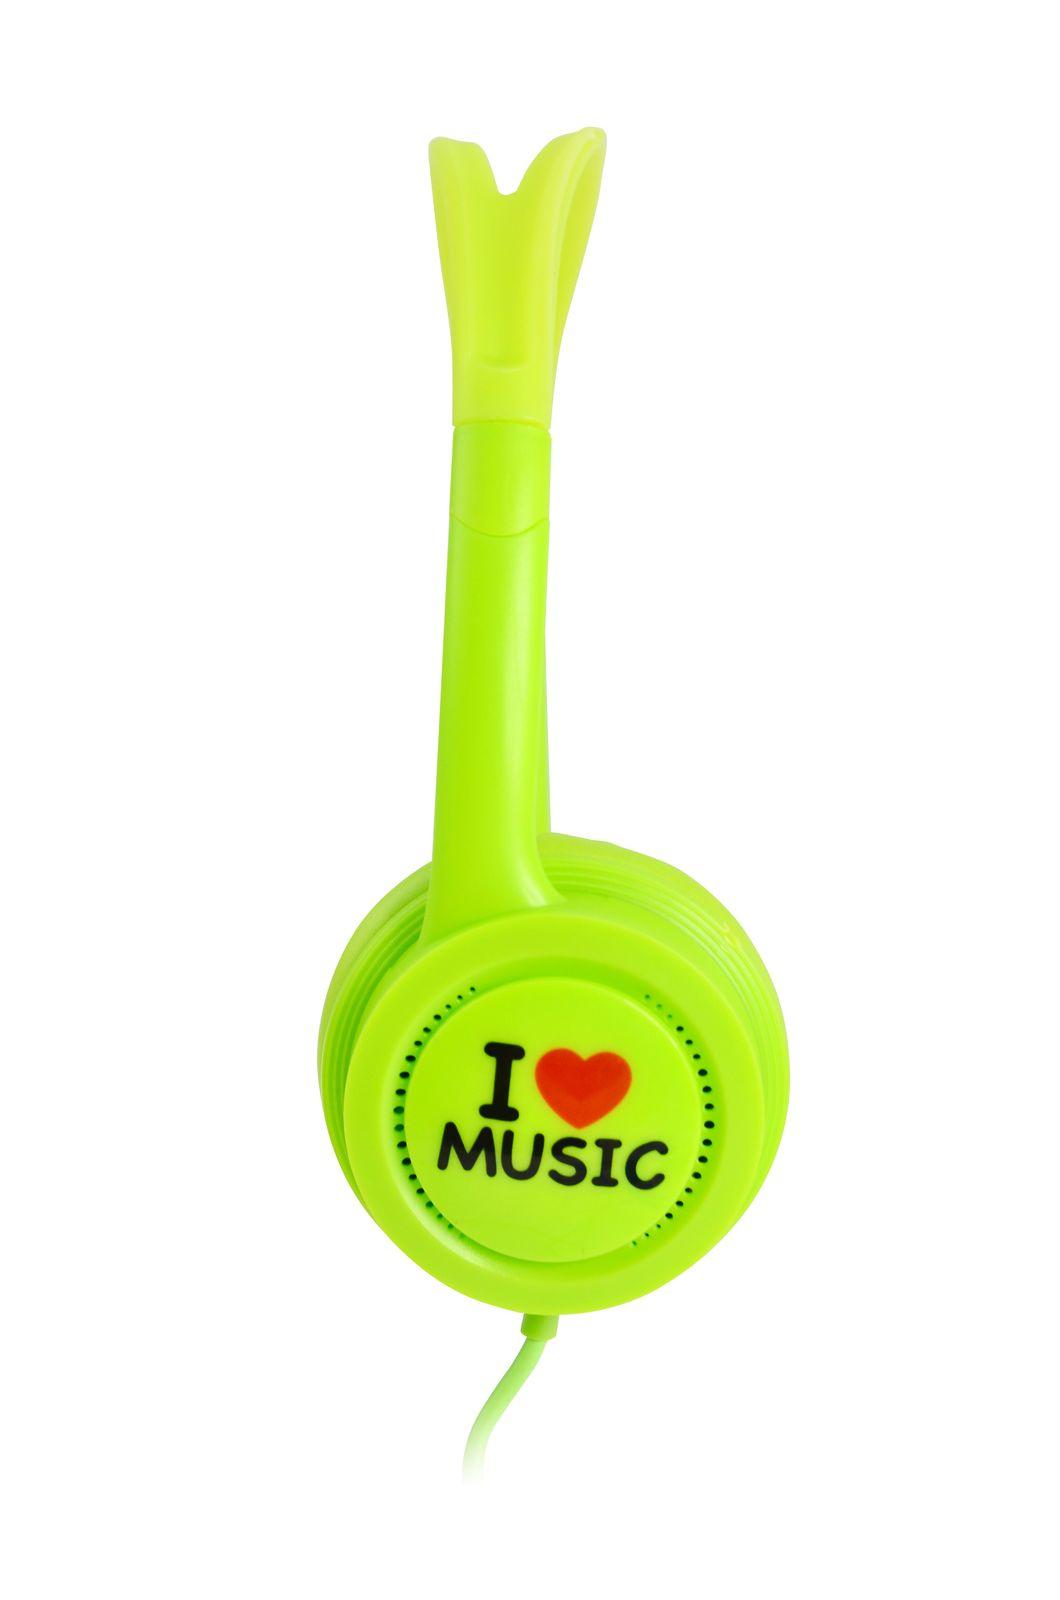 iDance Hedrox Junior Volume Limiting Kids Headphones - Green image